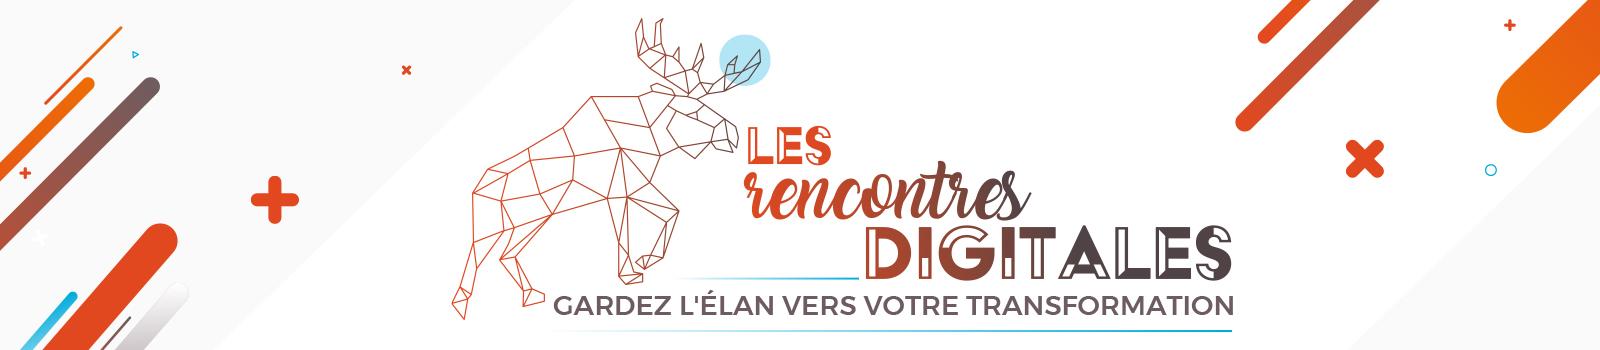 agiris-2021-pa rencontres digitales-0820